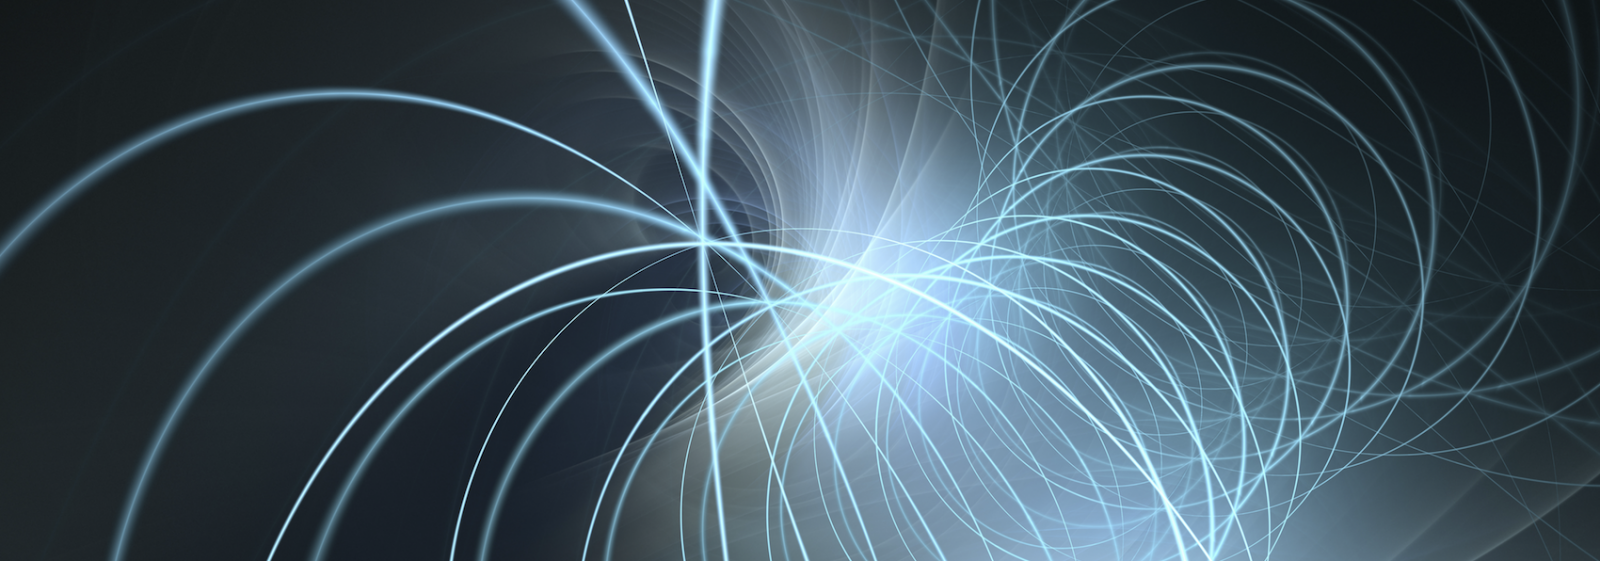 entanglement banner2